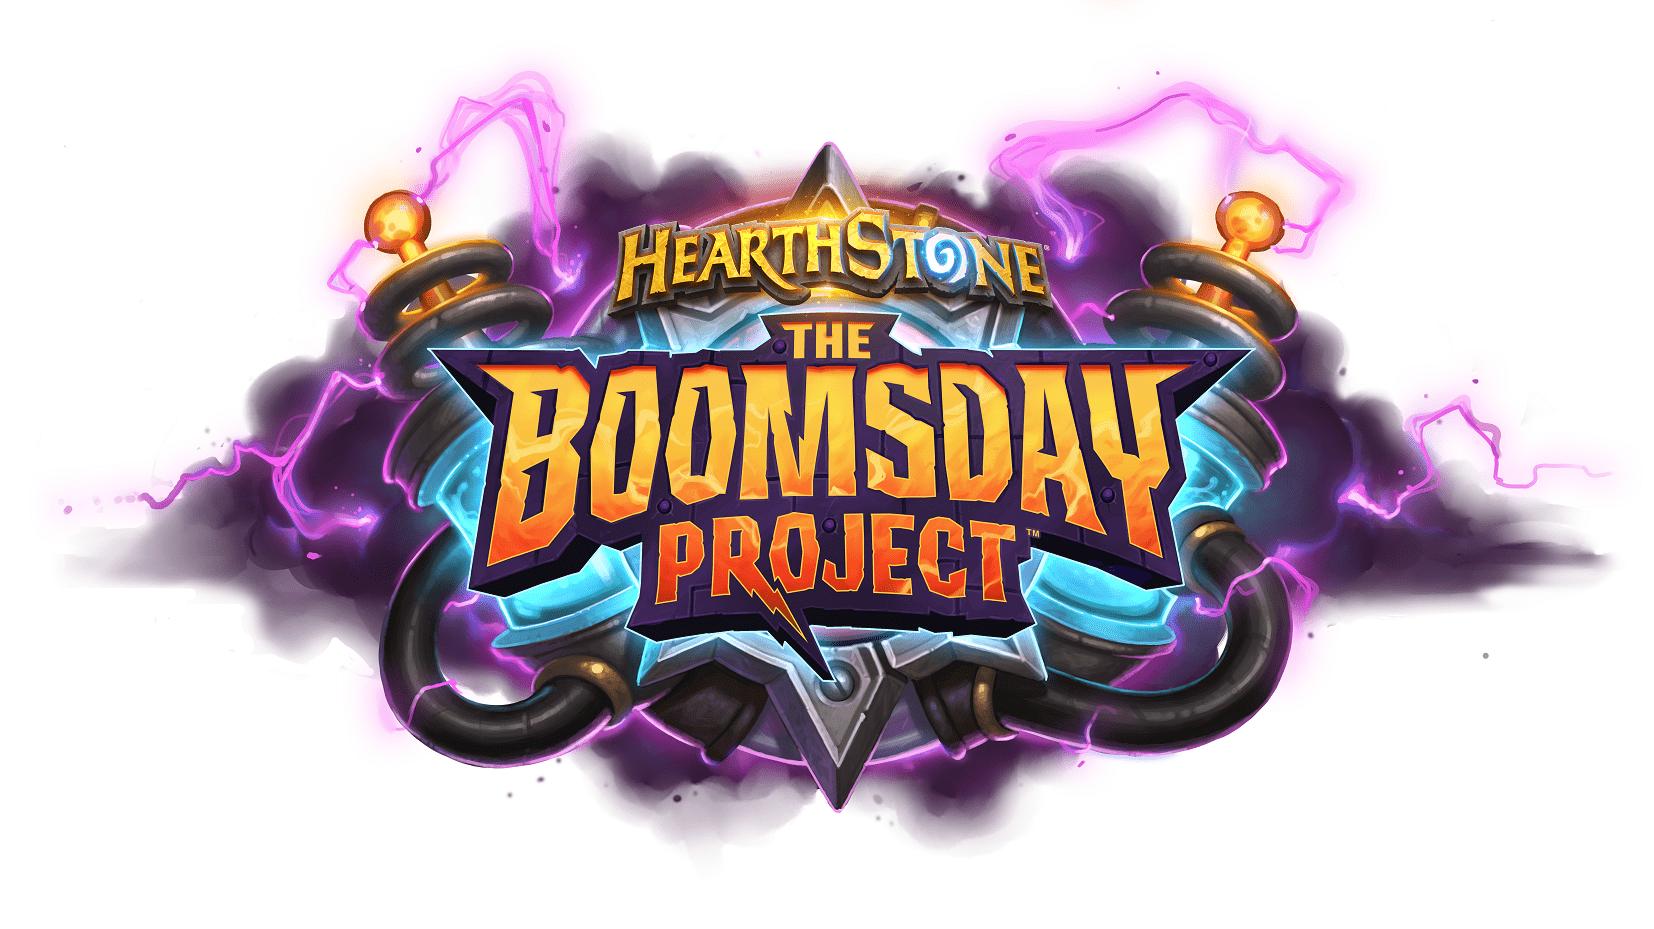 Blizzard kondigt nieuwe Heartstone expansion aan